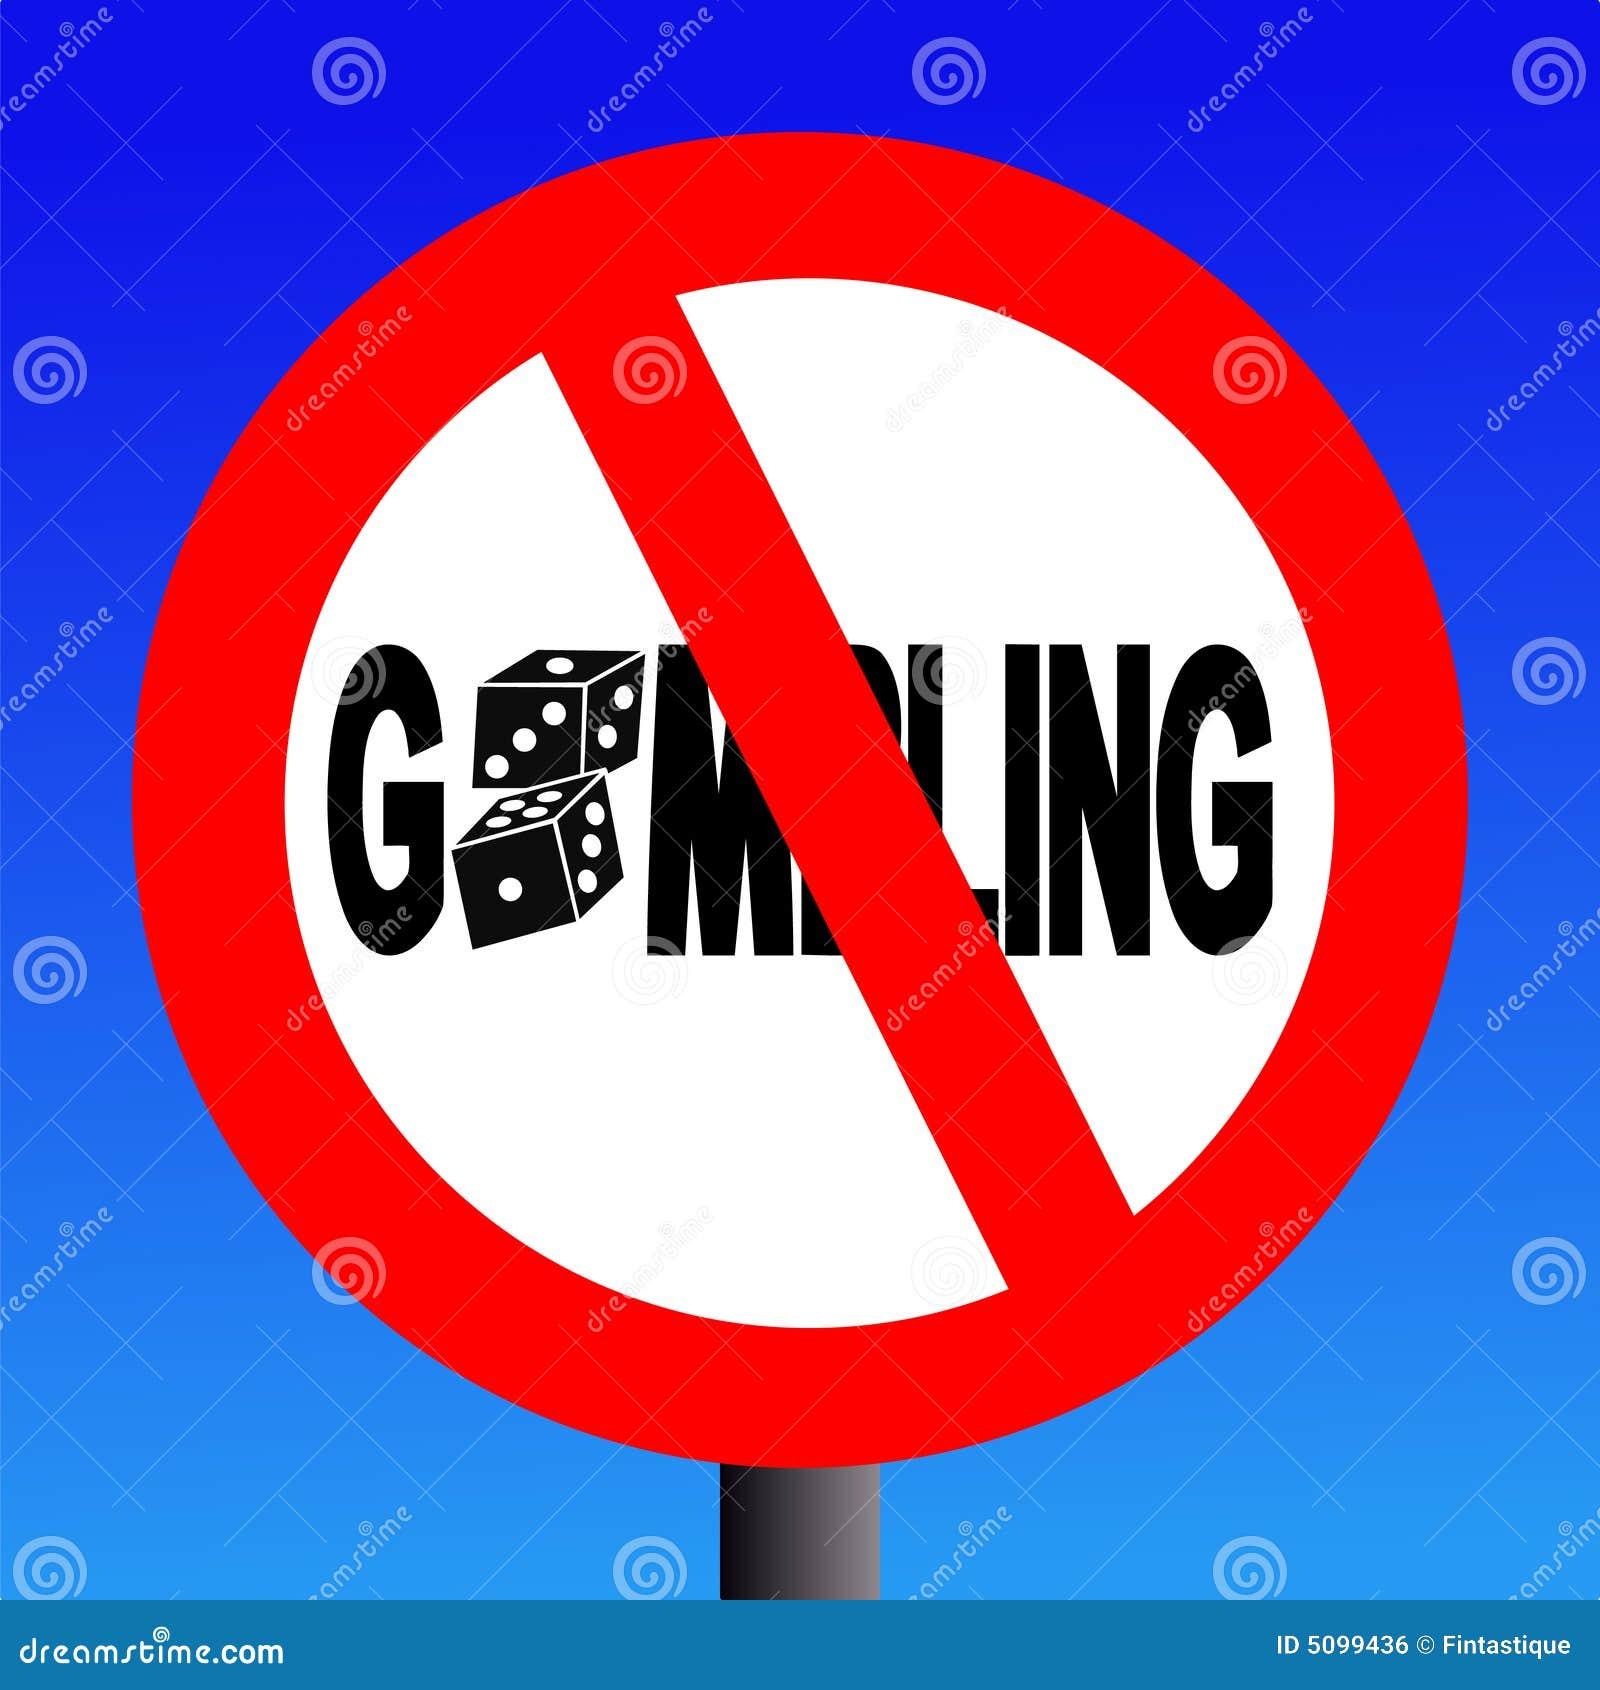 us online gambling legal